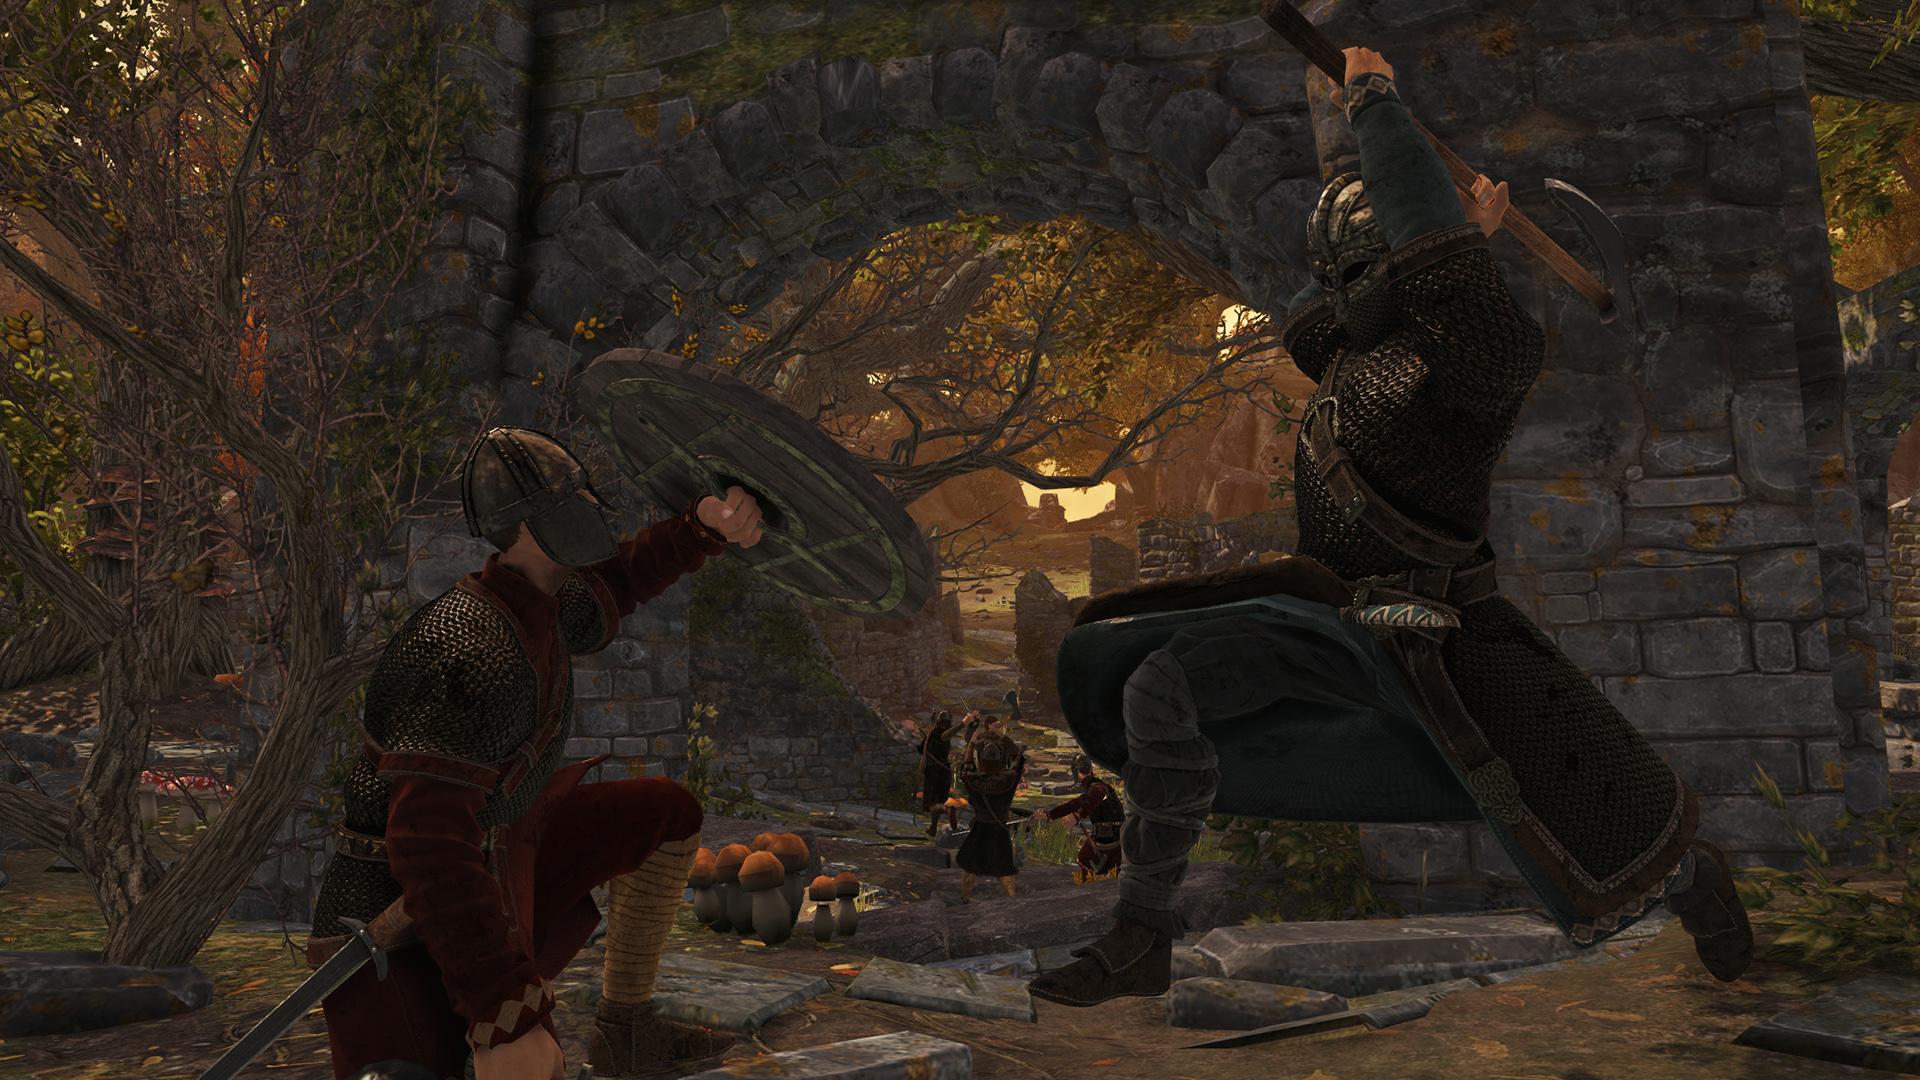 War_of_the_Vikings_Screenshot_07.jpg